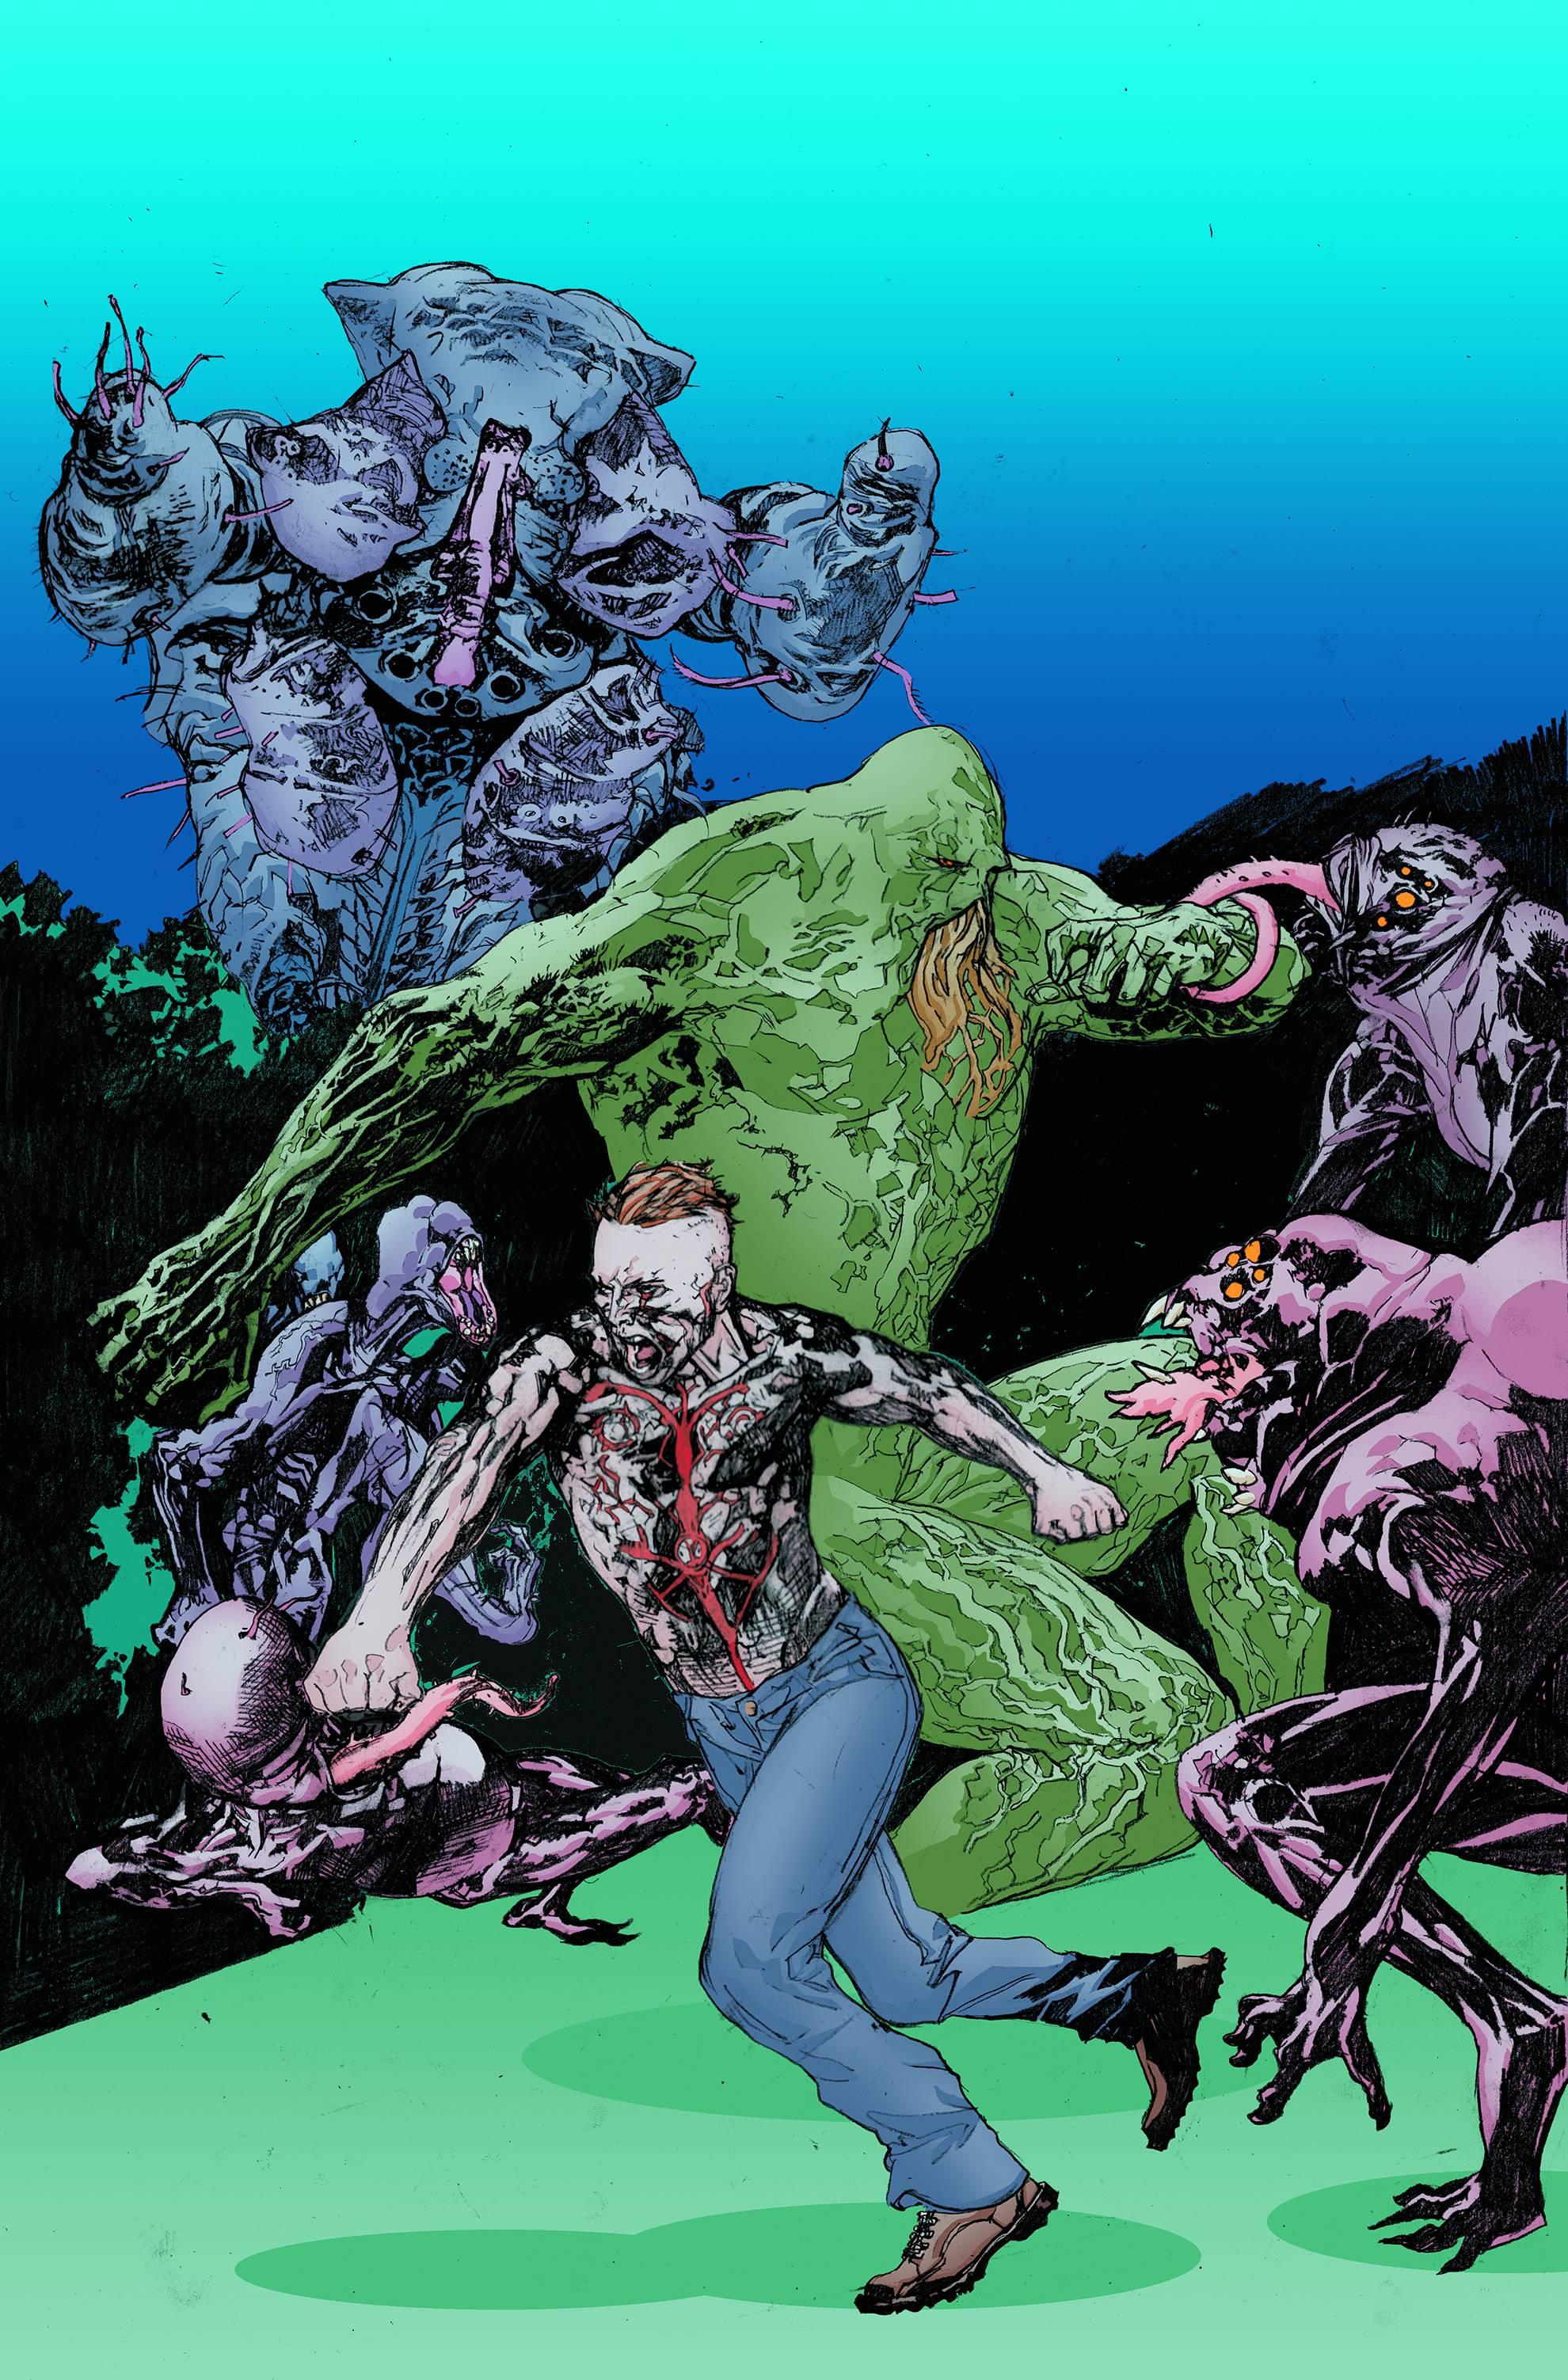 ANIMAL MAN BY GRANT MORRISON HC BOOK 01 30TH ANNIV DLX ED DC COMICS